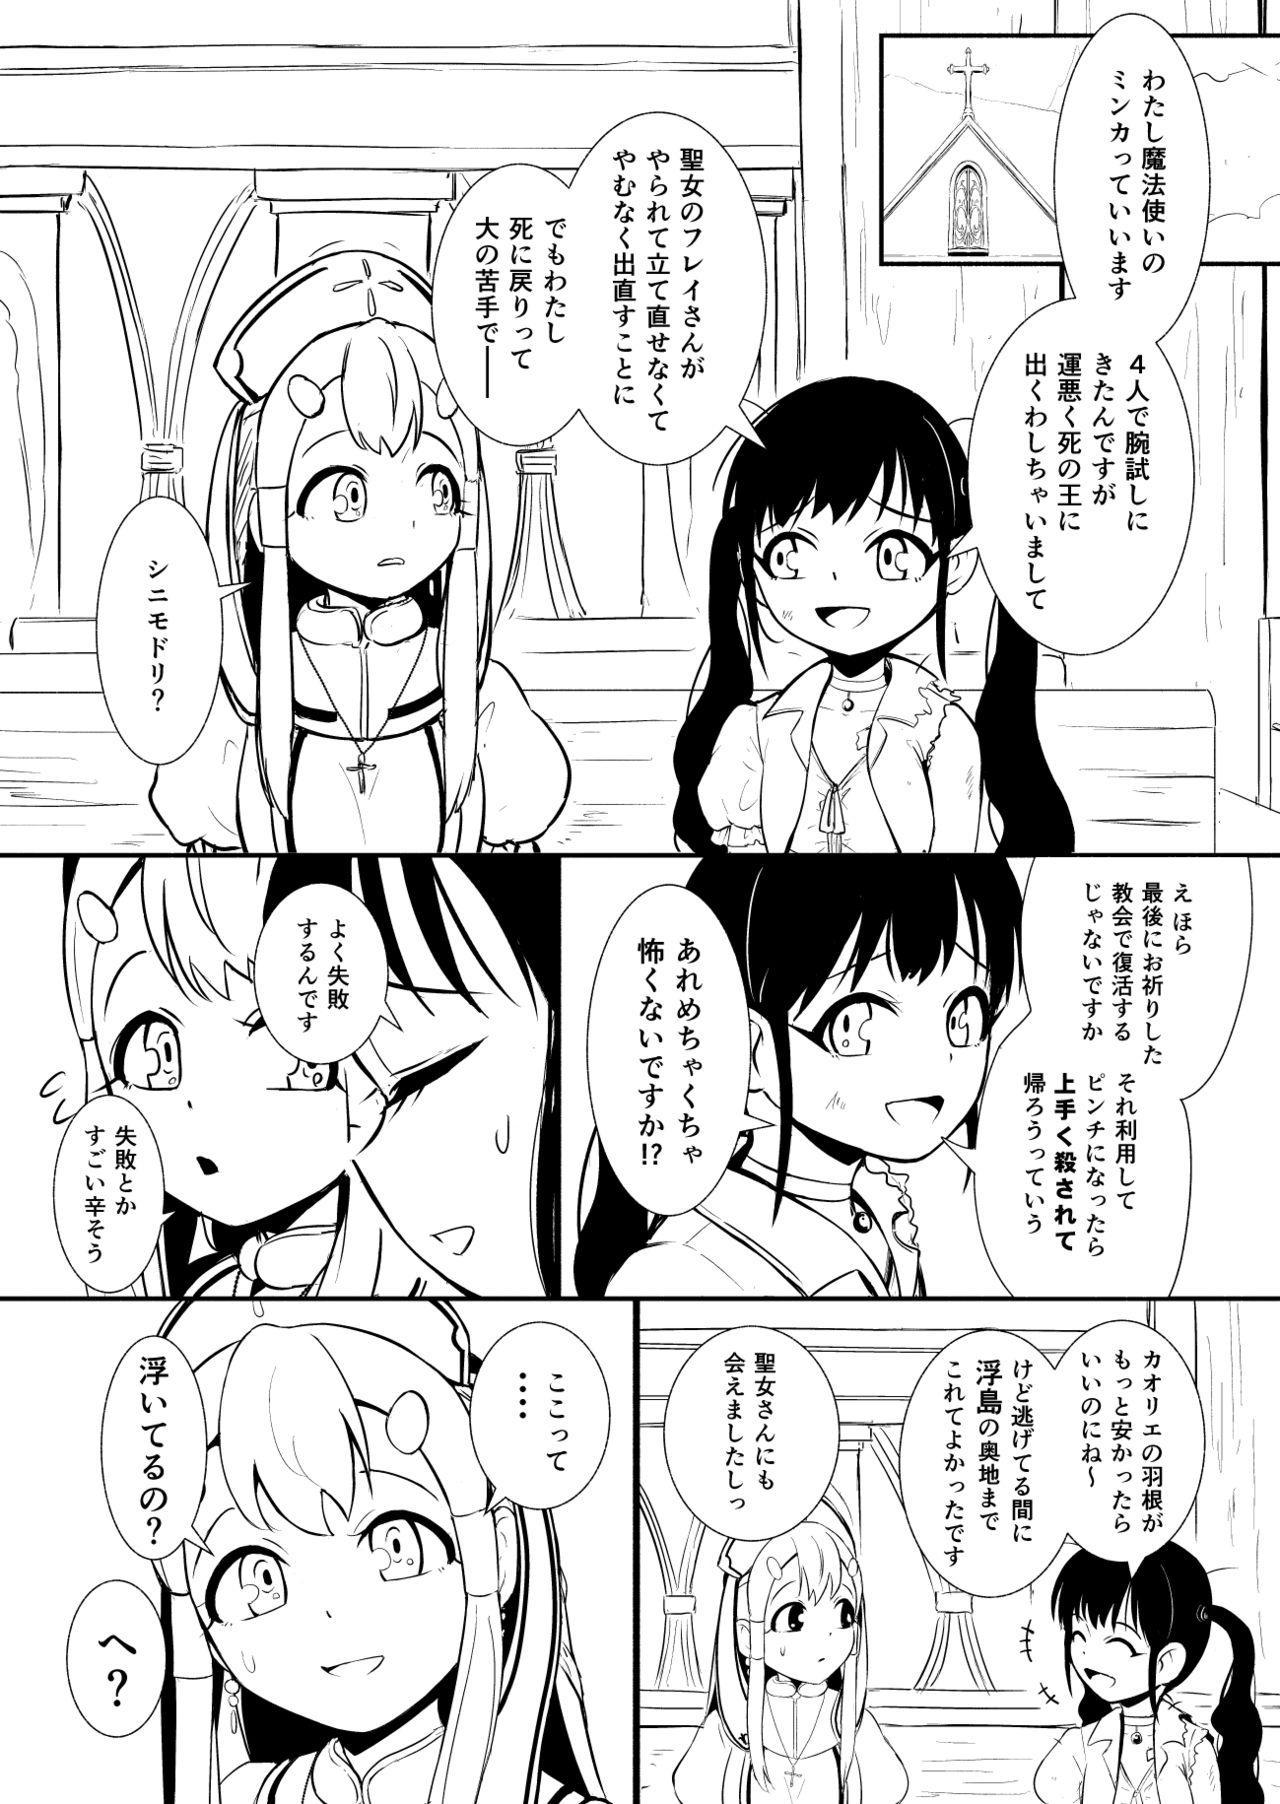 Henkyou no Seijo 28